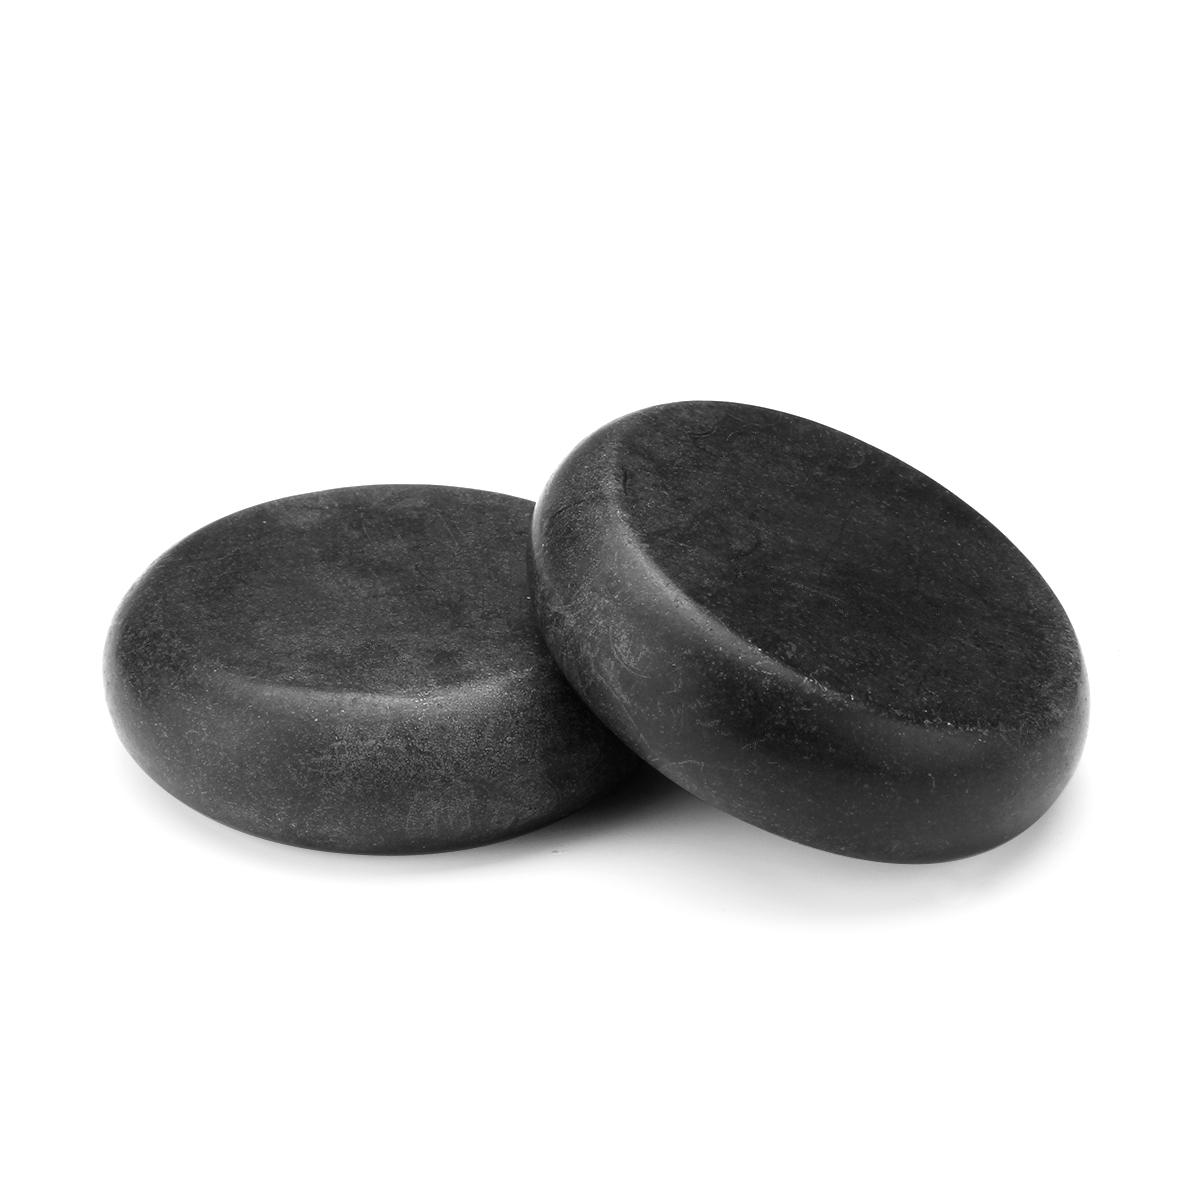 10 Pcs Hot Massage Stones Set Heater Natural Basalt Warmer Rock Kit 2.34 Inch